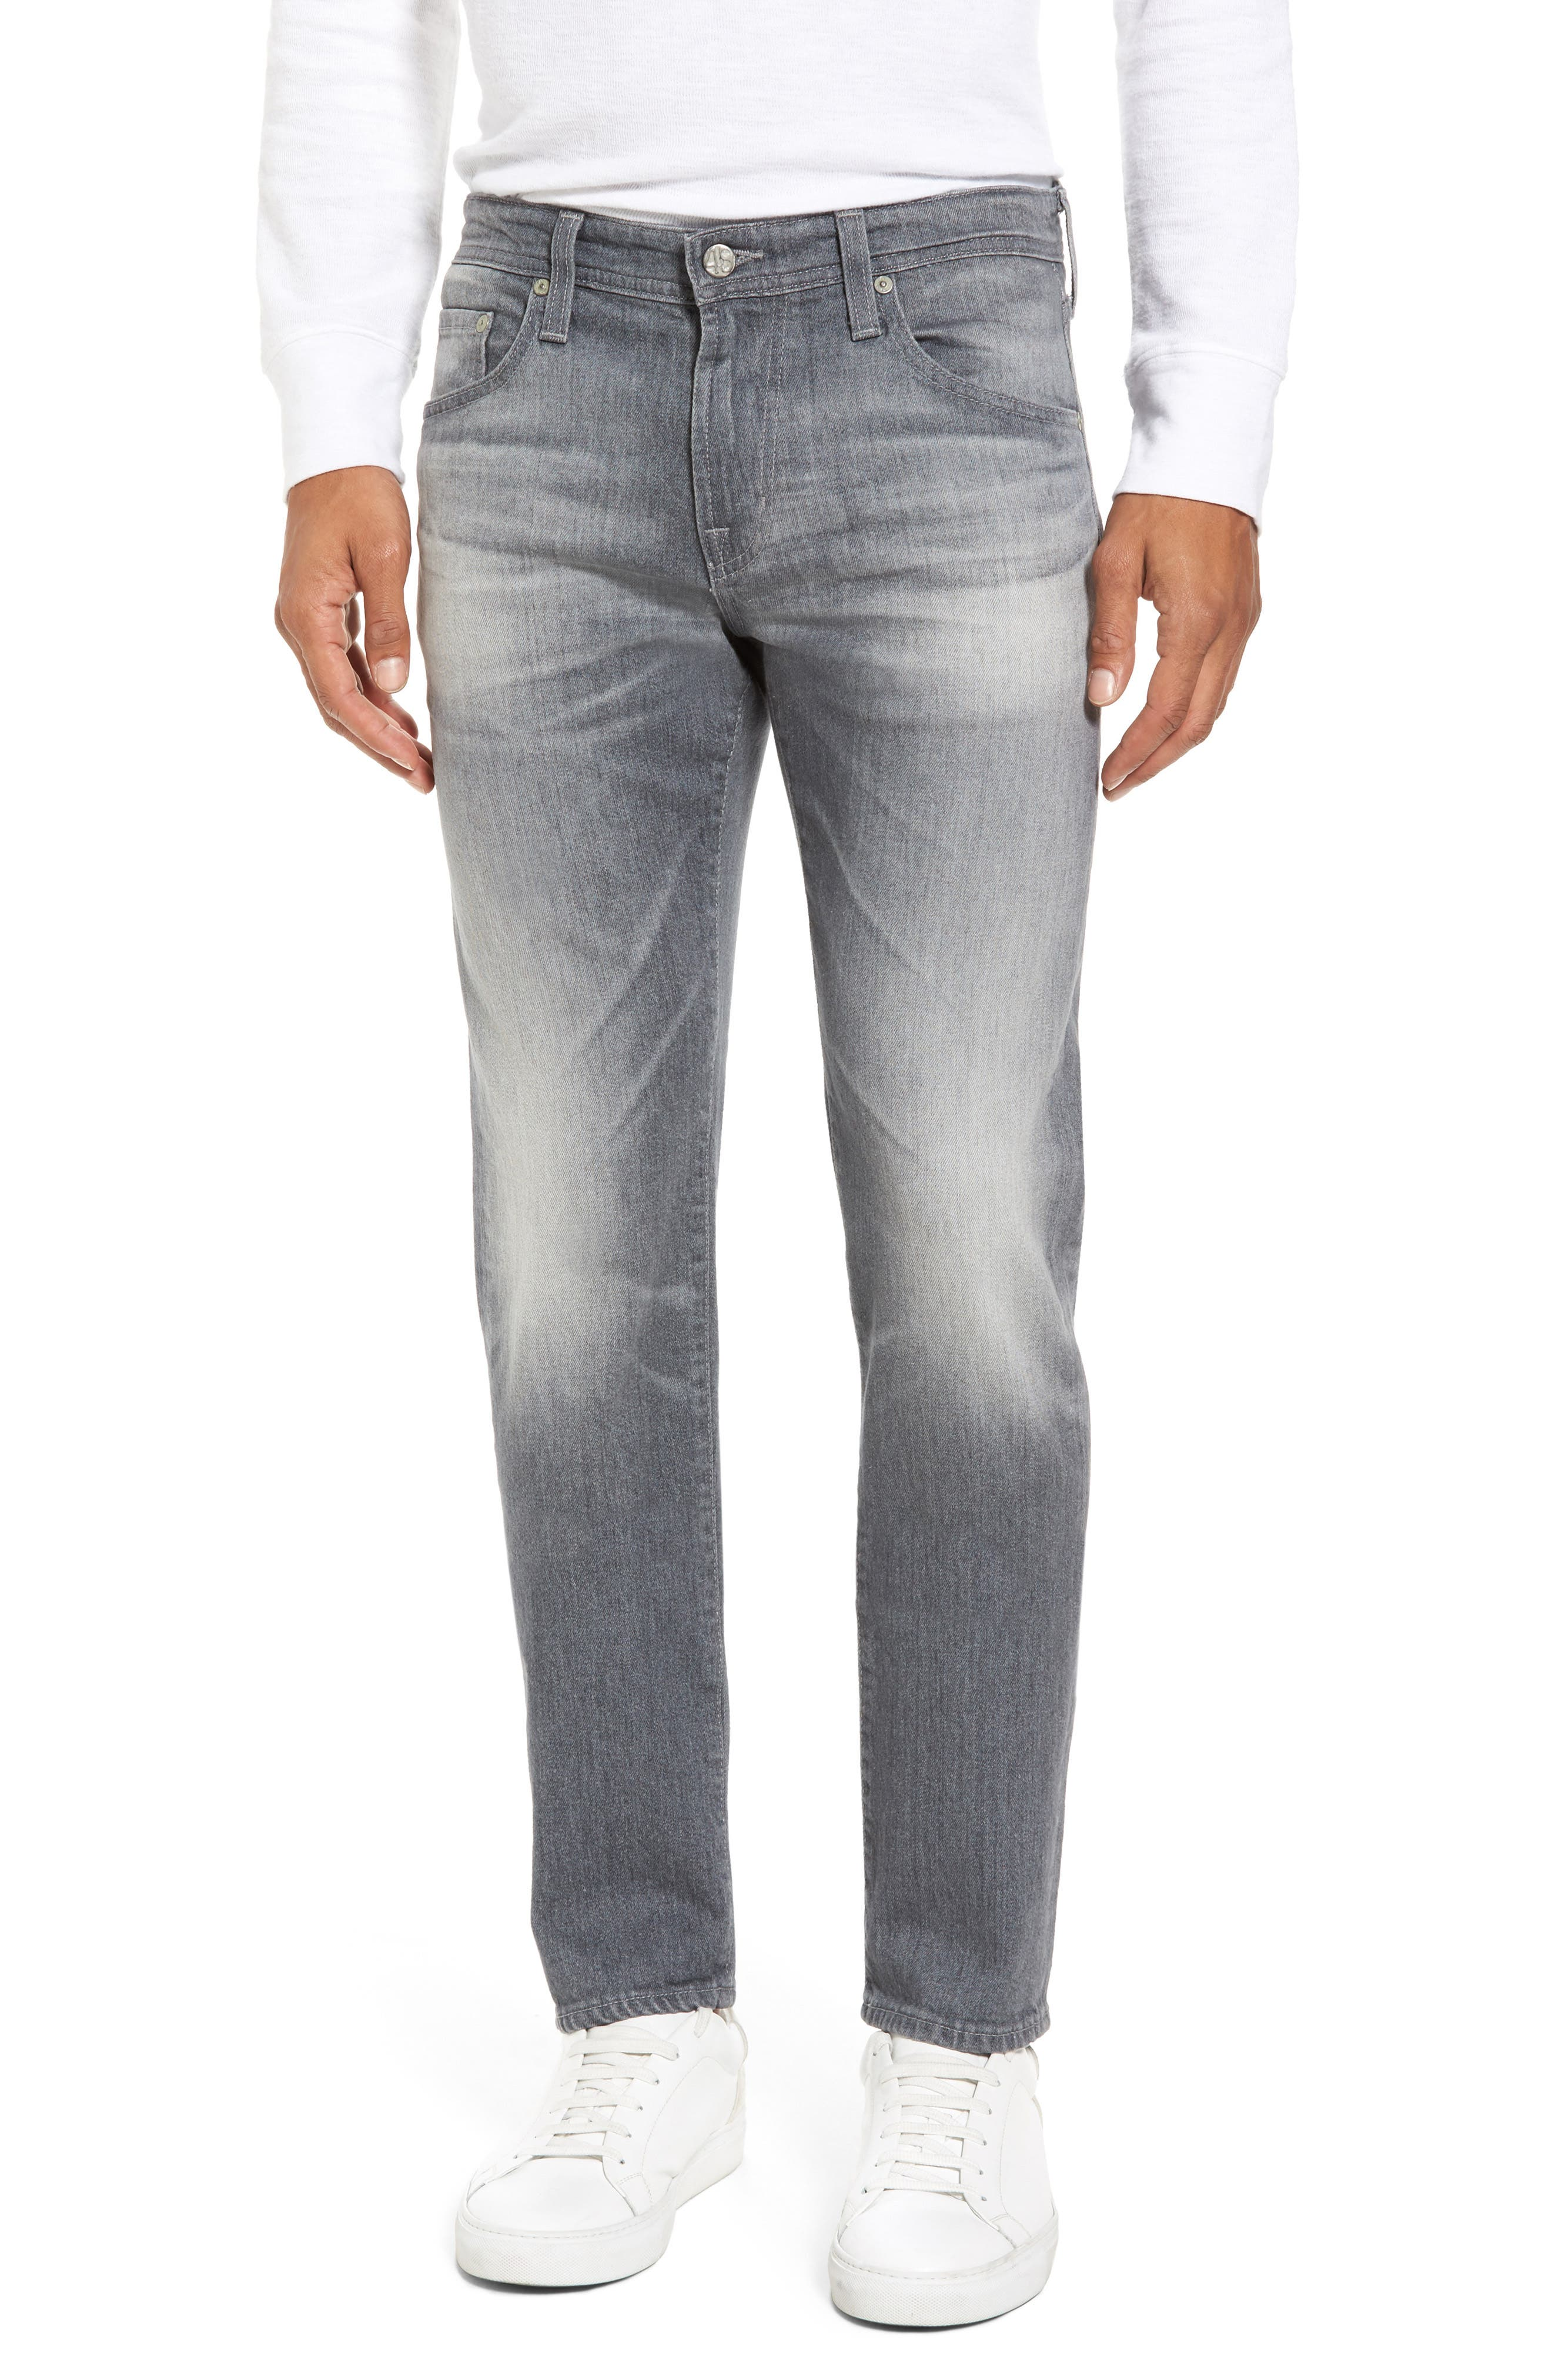 Tellis Modern Slim Fit Jeans,                             Main thumbnail 1, color,                             020